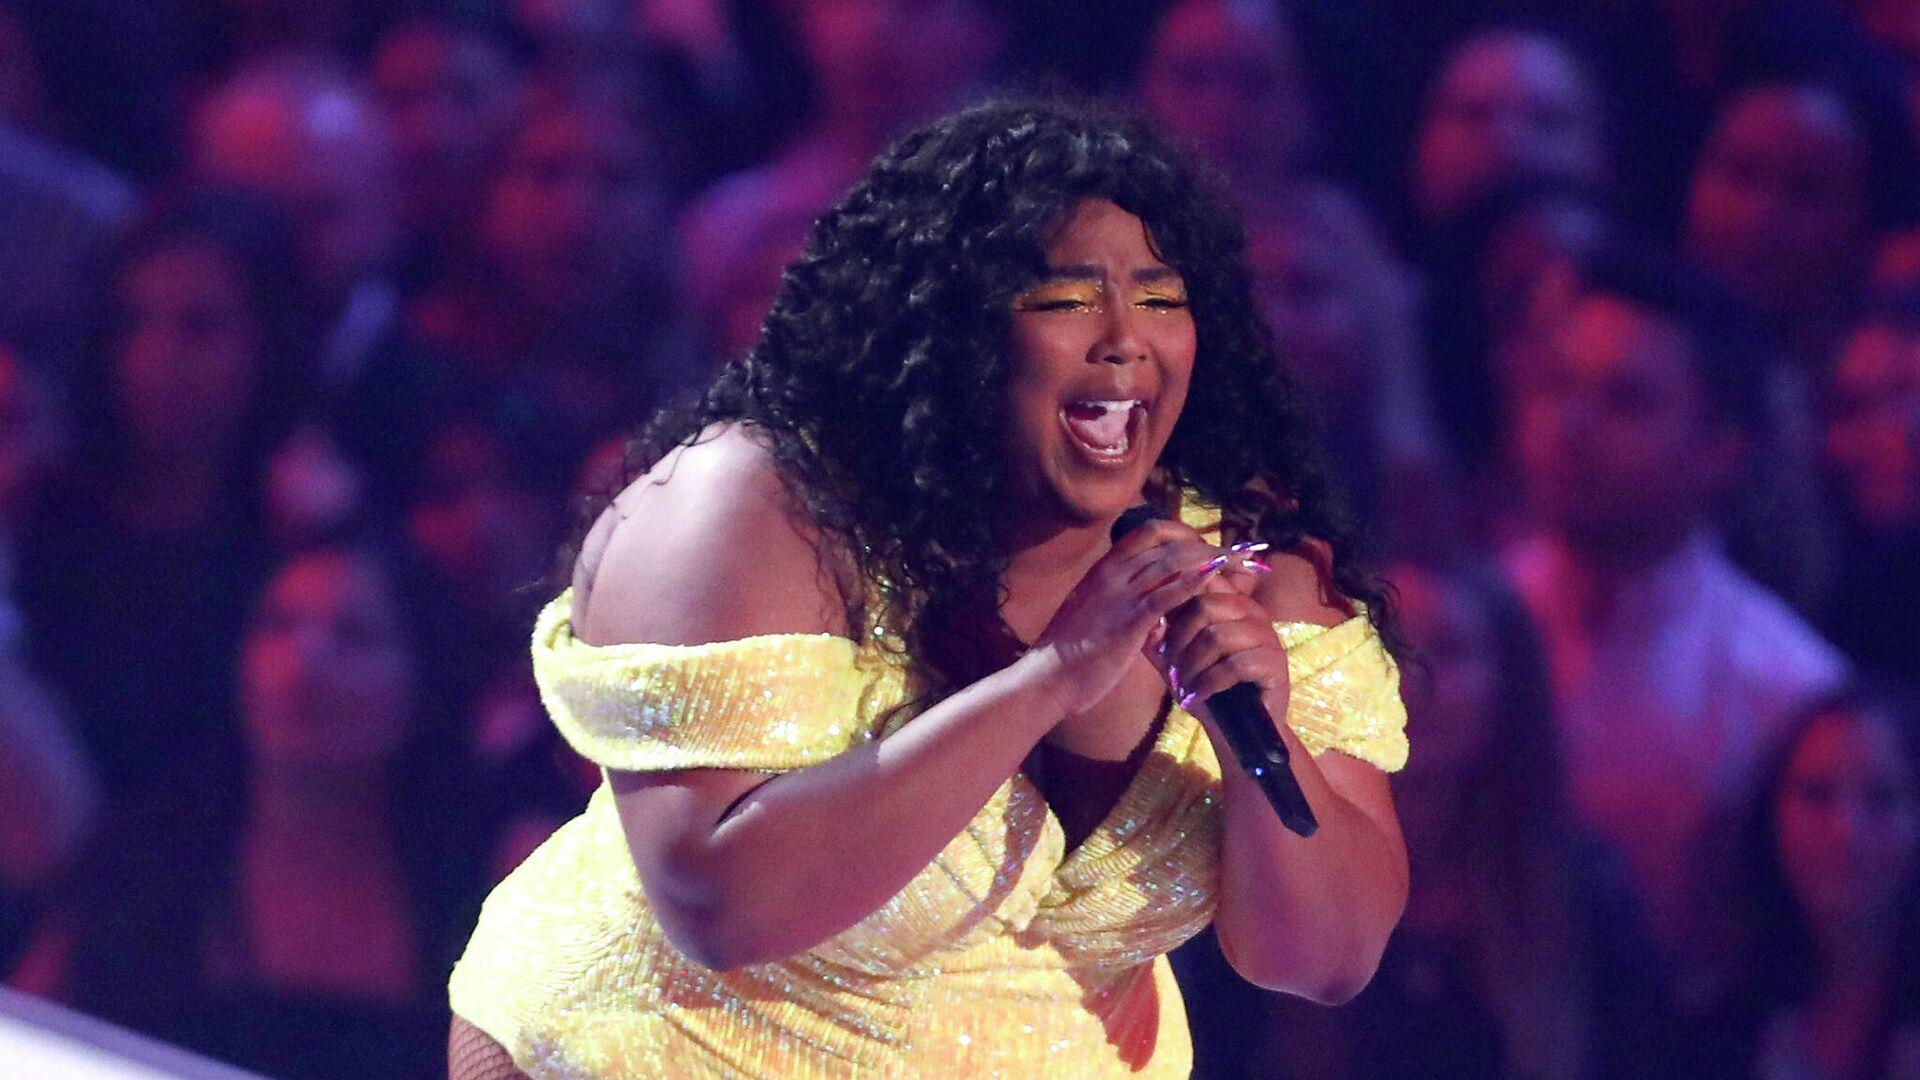 Певица Лиззо на церемонии вручения премии 2019 MTV Video Music Awards - РИА Новости, 1920, 18.09.2021